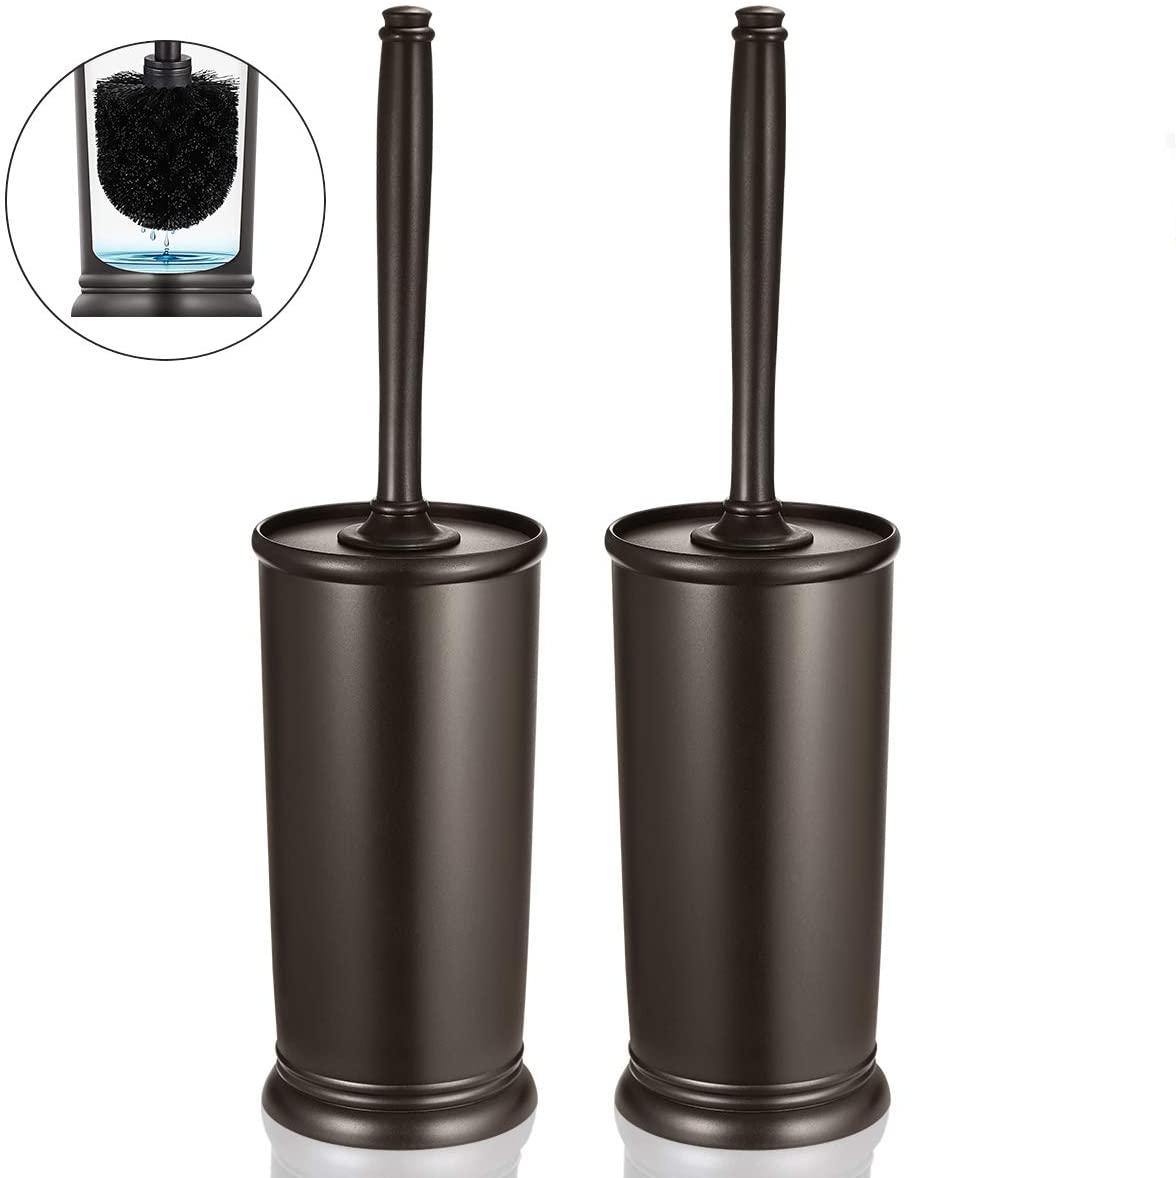 Toilet Brush and Holder, Deep Cleaning Toilet Bowl Brush Set Ergonomic 2 Pack - Bronze